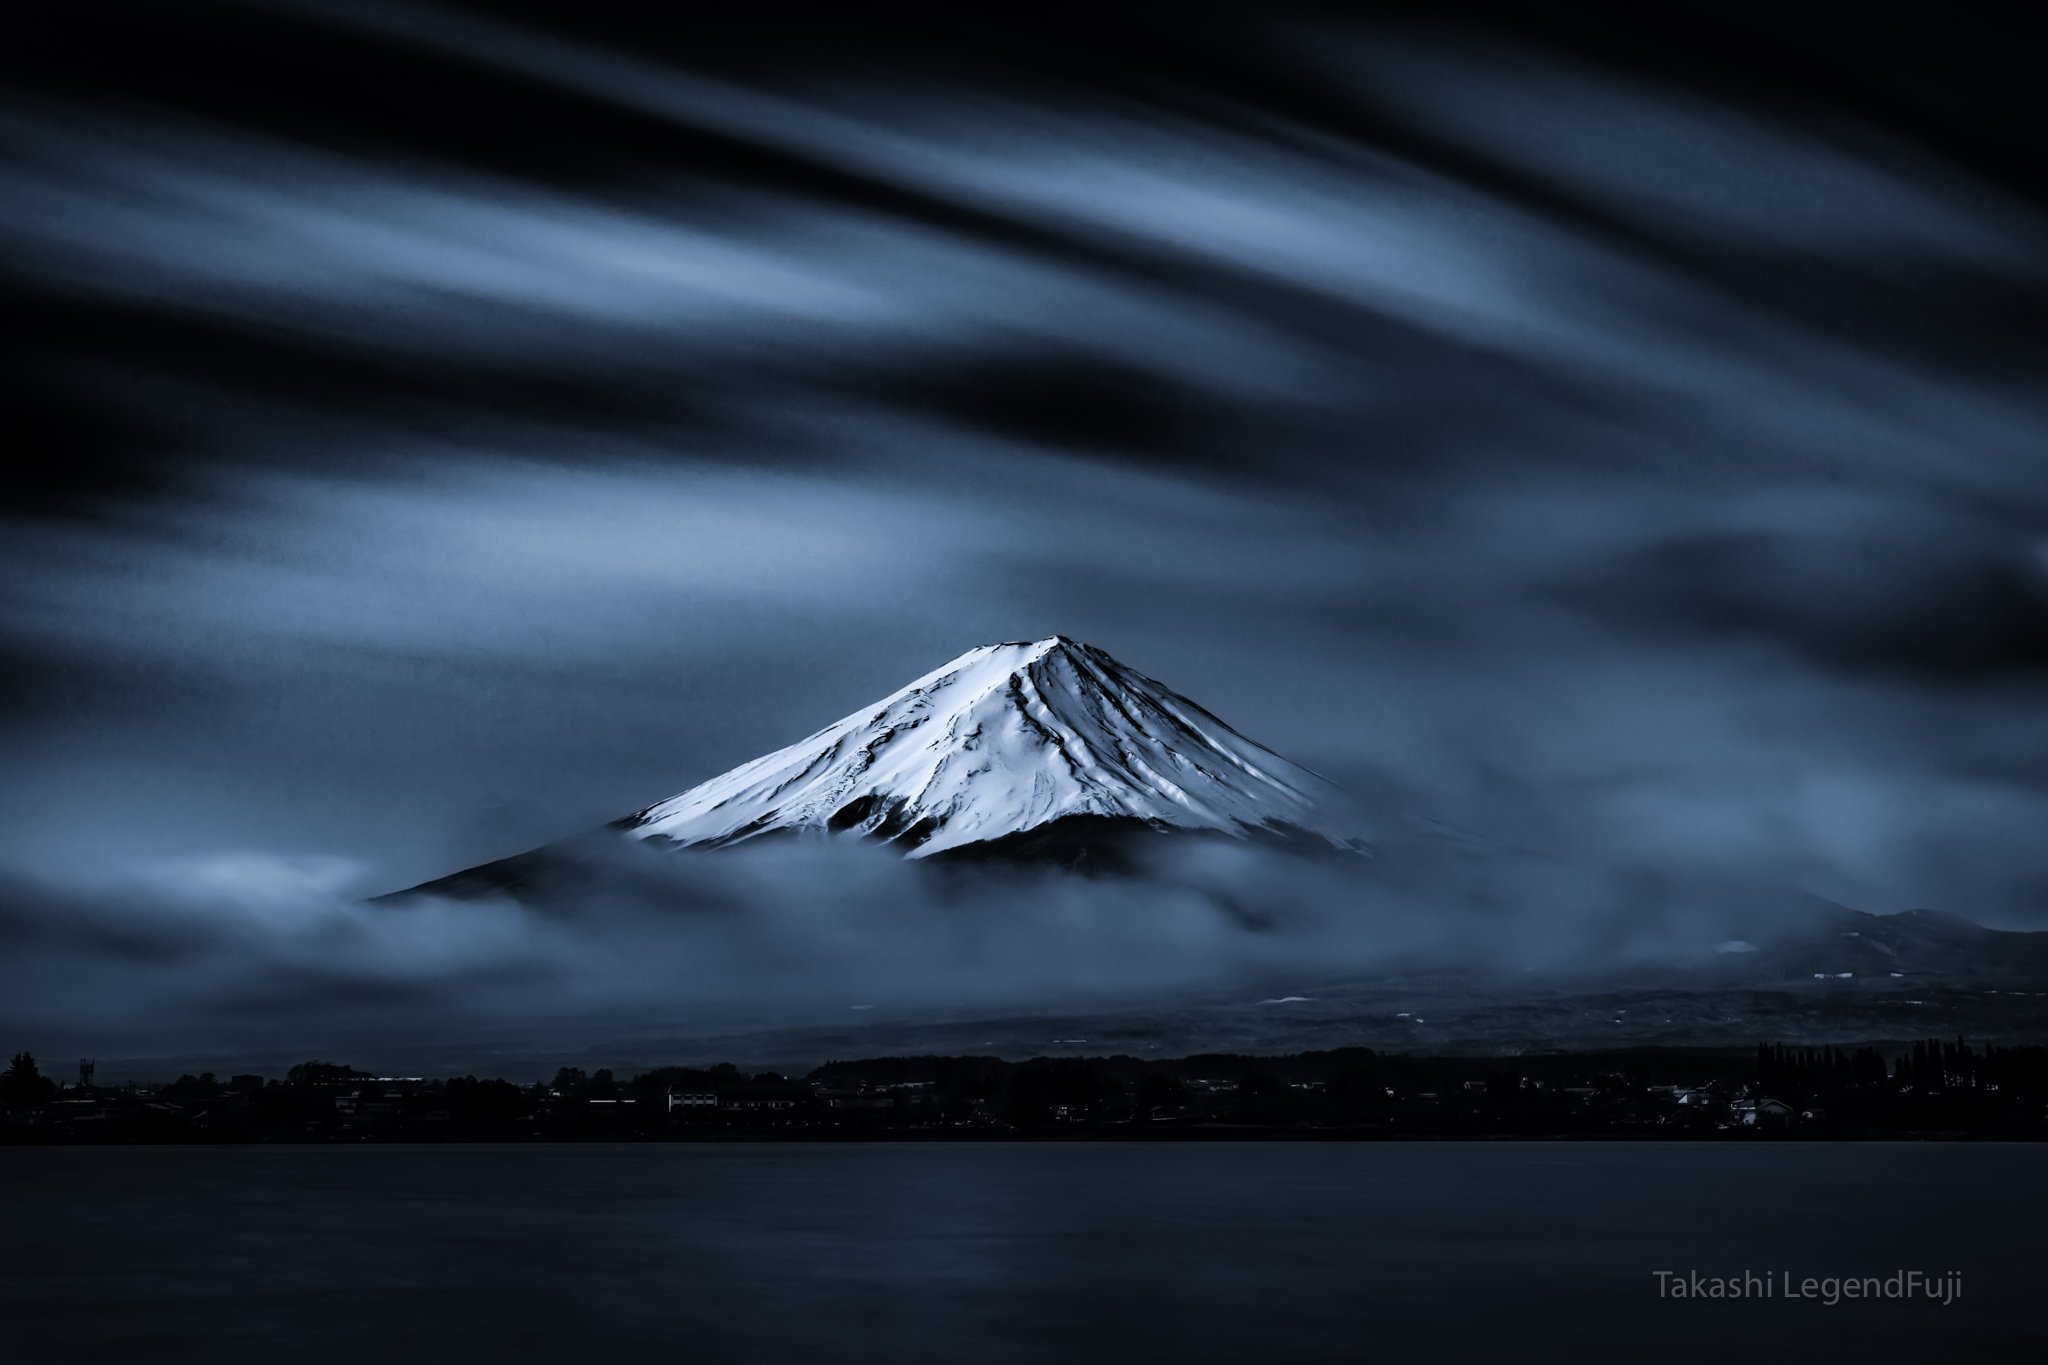 Fuji,mountains,landscapes,clouds,snow,beautiful,amazing,lake,blue,sky,Japan,, Takashi